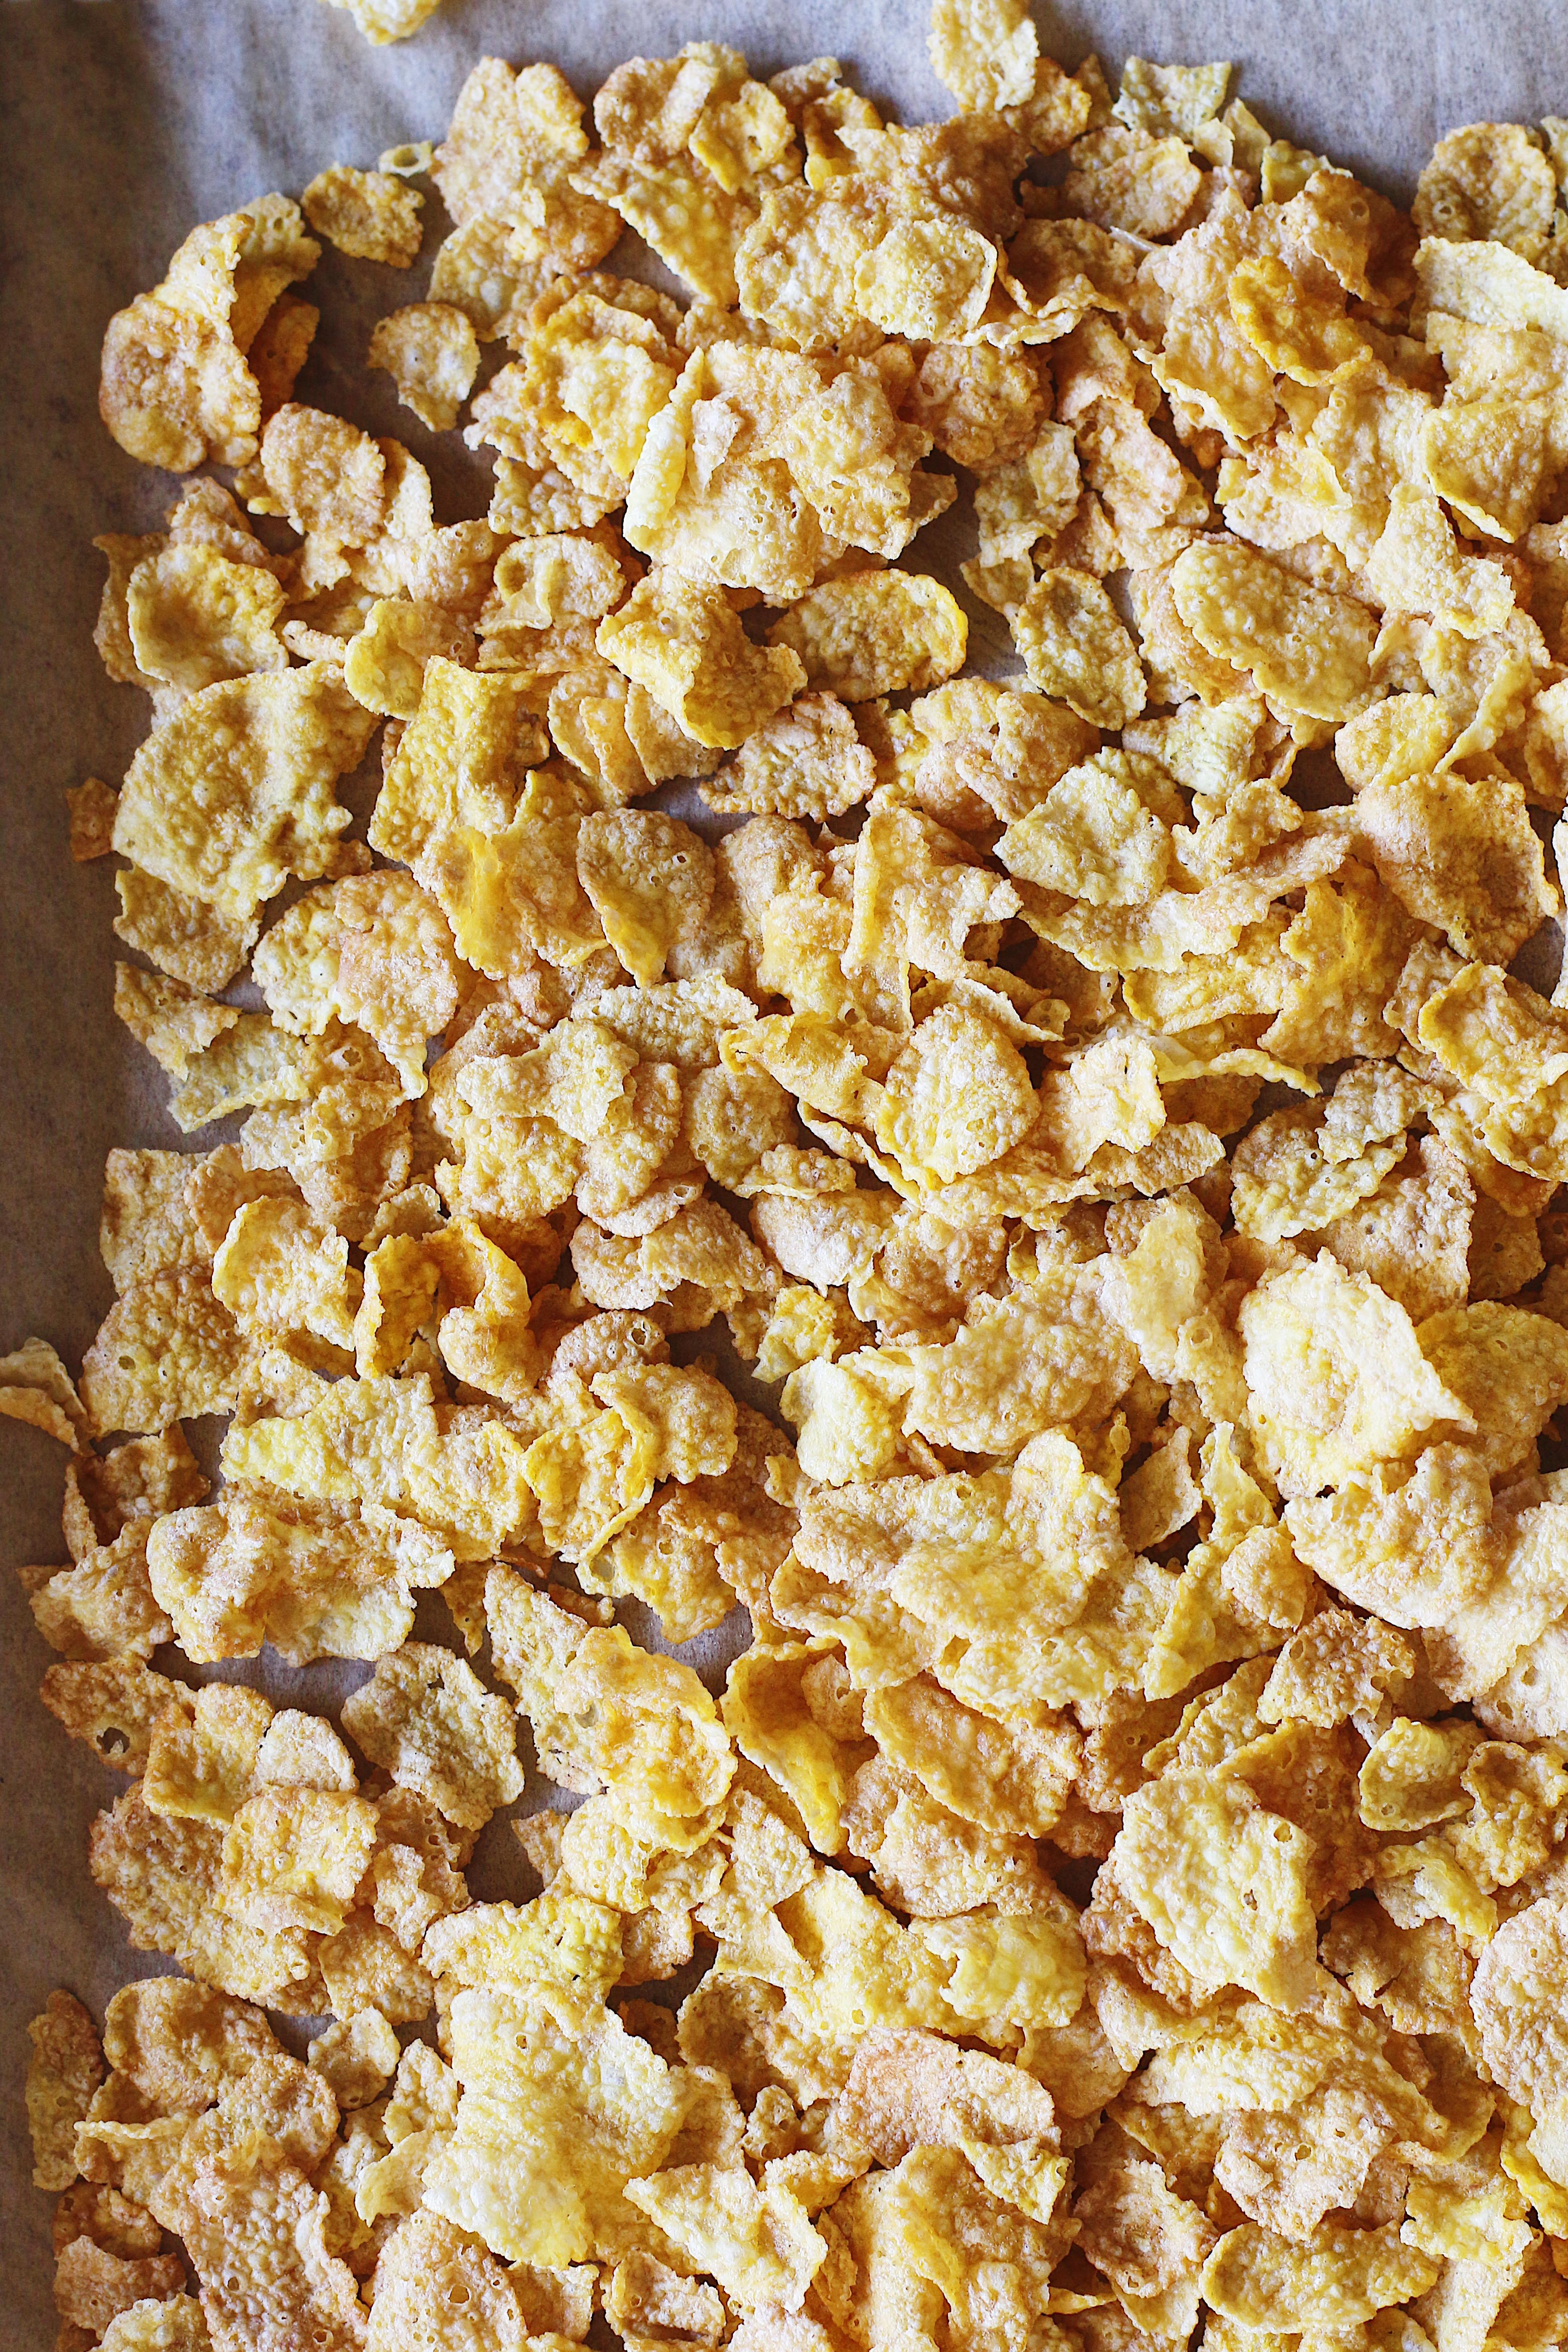 momofuku-milk-bar-cookbook-cereal-milk-cornflakes